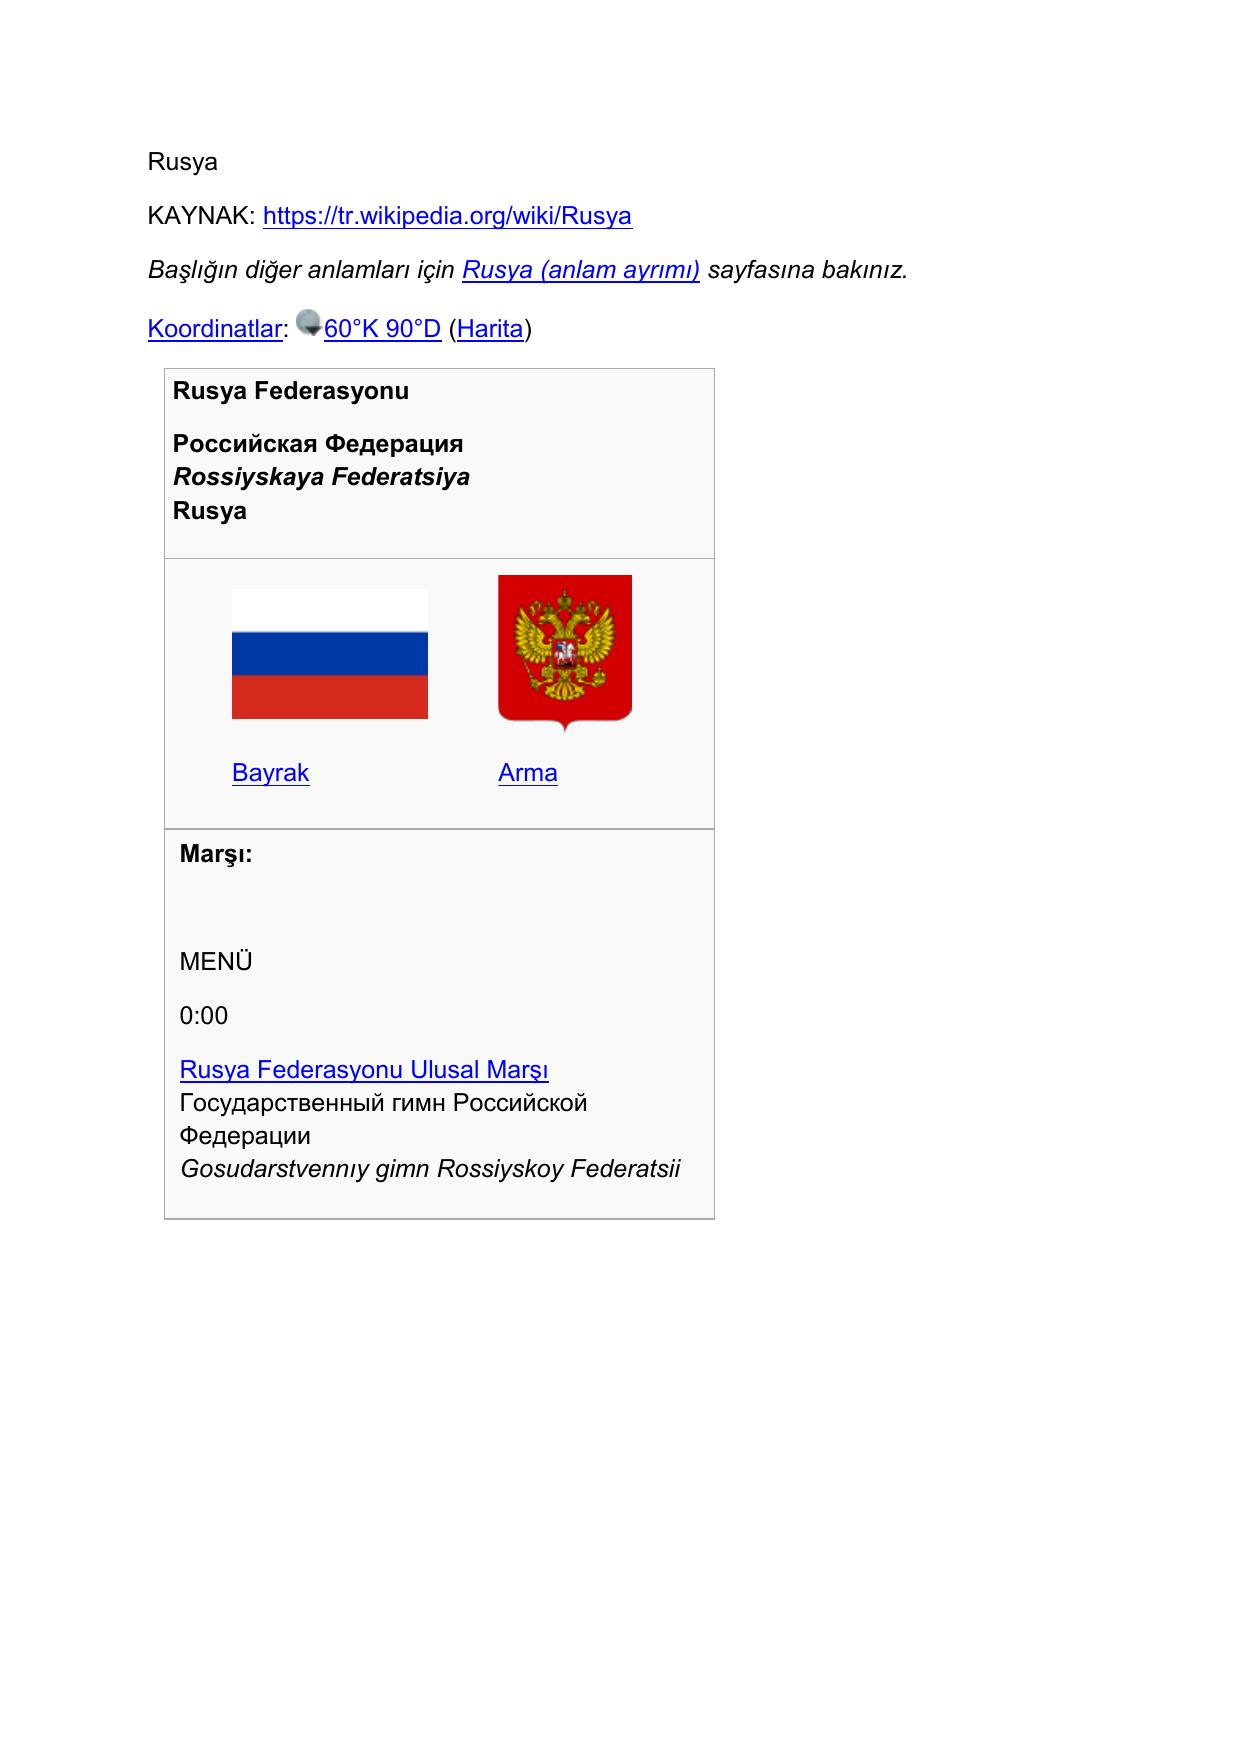 Kurucu Meclisin Rusyadaki Konvansiyonu